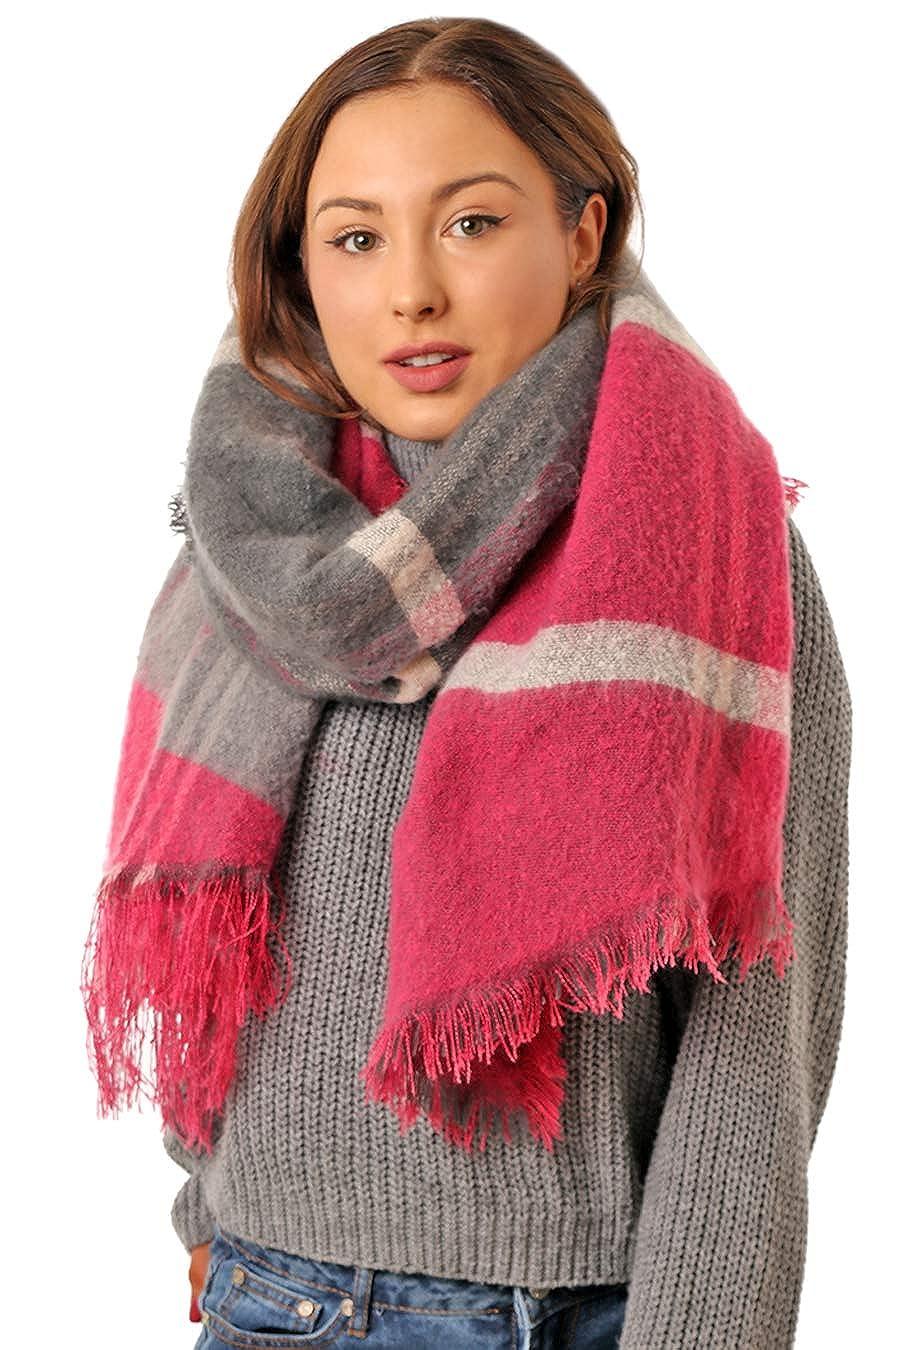 fdf1e3b2adba0 Super Soft Thick Warm Womens Blanket Scarf Winter - Plaid Tartan Scarf  Ladies - Scottish Gifts - Scarves for Women - Large Oversized Blanket -  Girlfriend ...